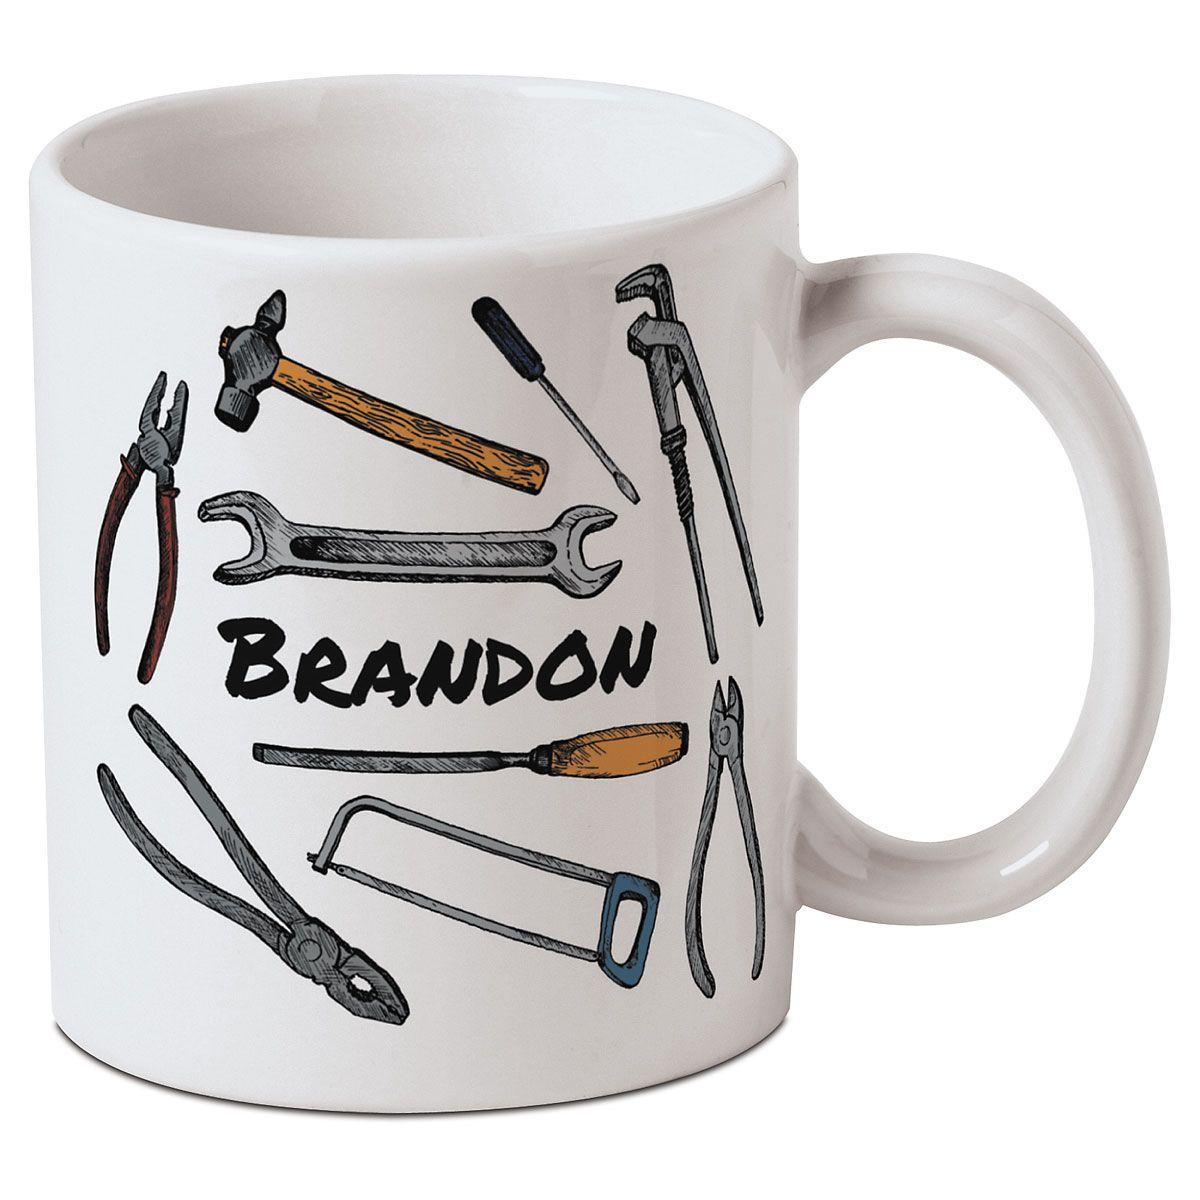 Personalized Tool Mug